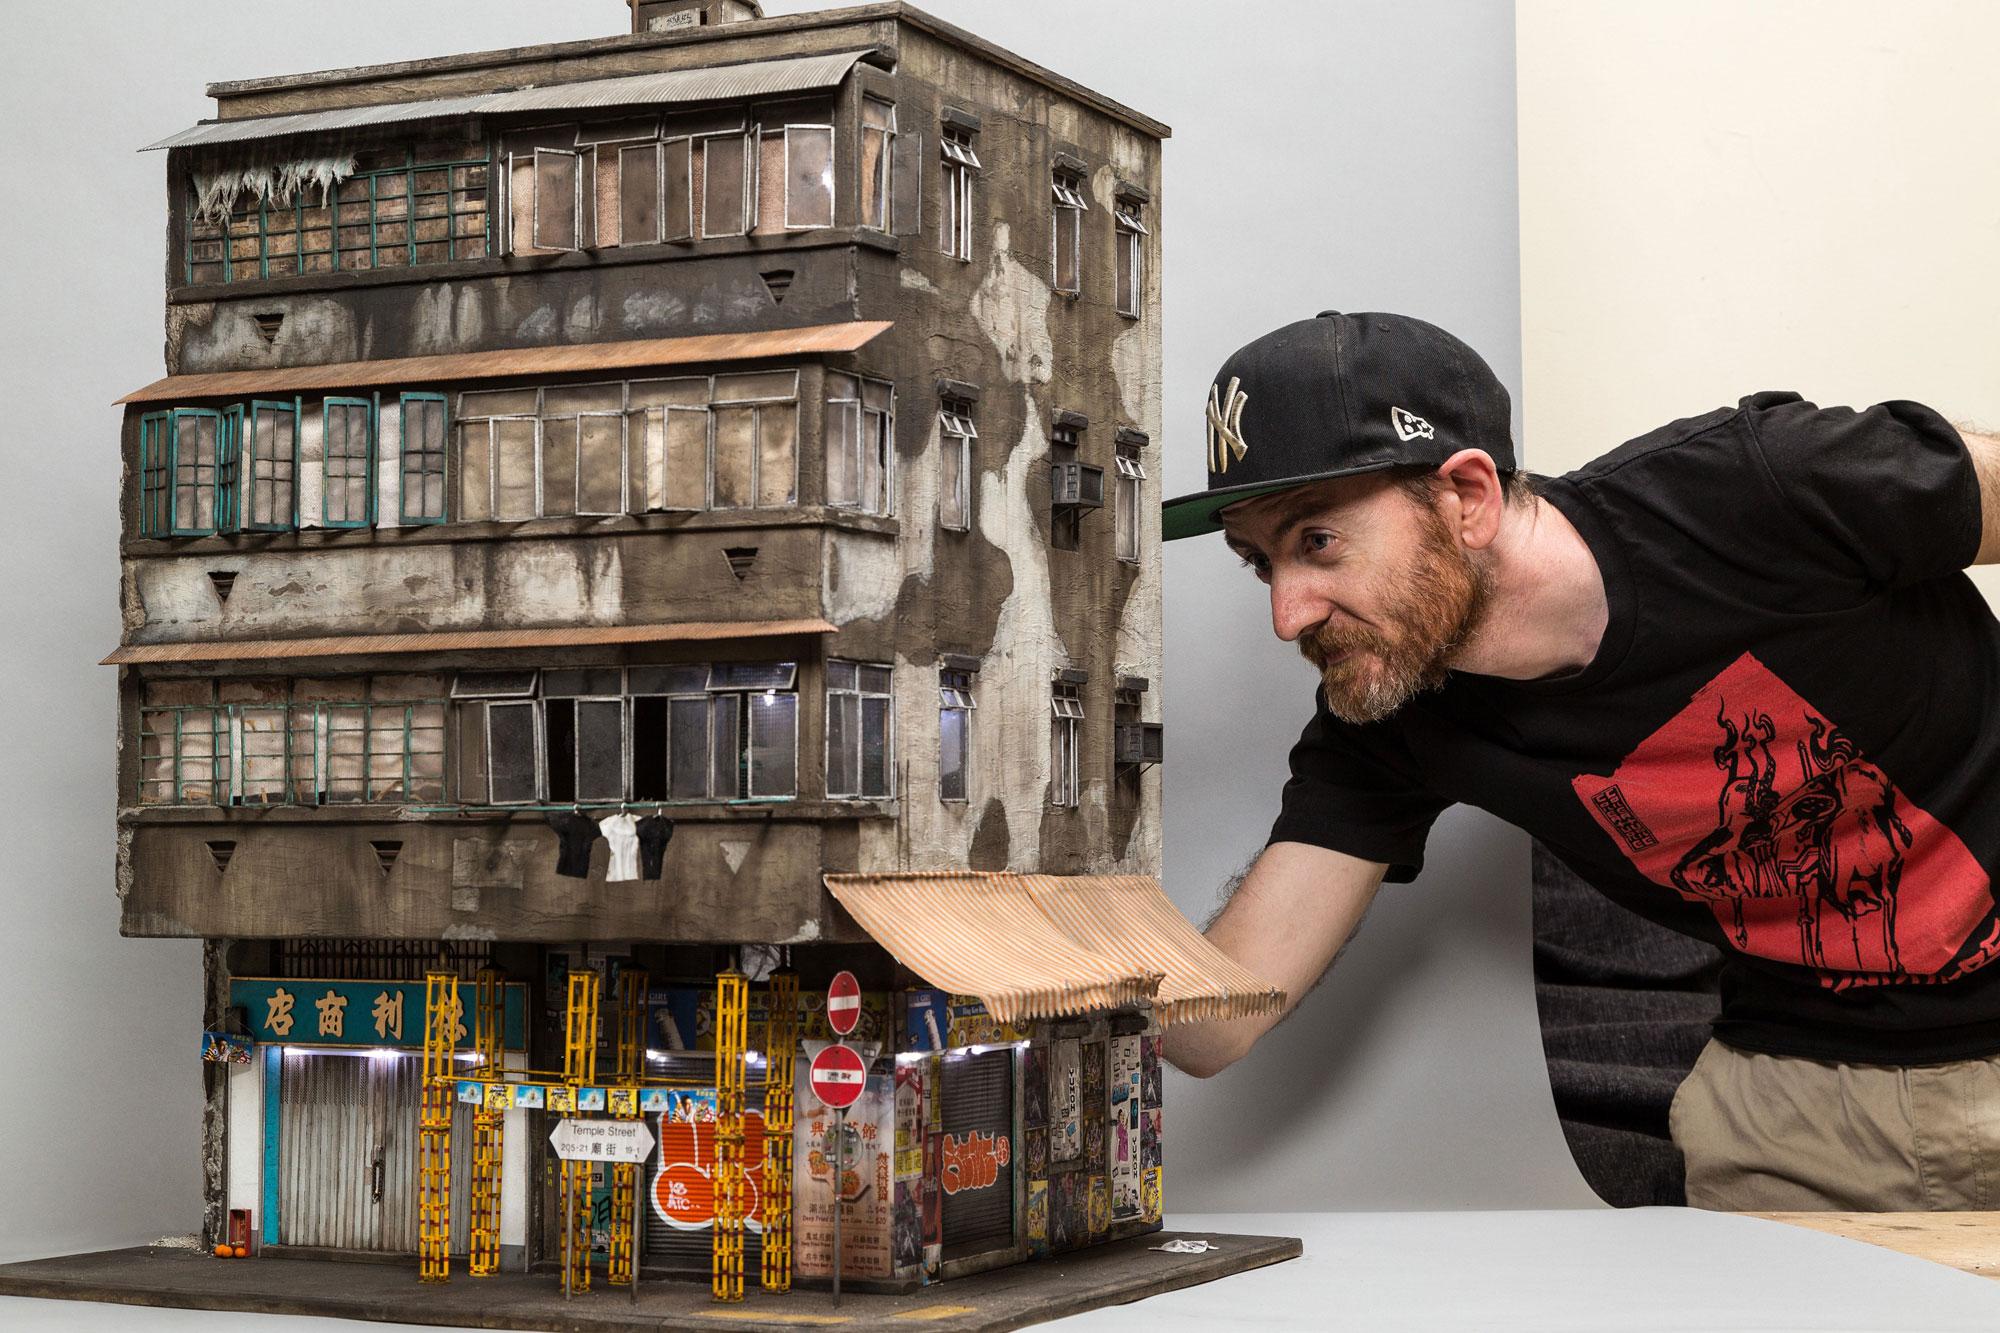 Miniature Contemporary Urban Buildings by Joshua Smith